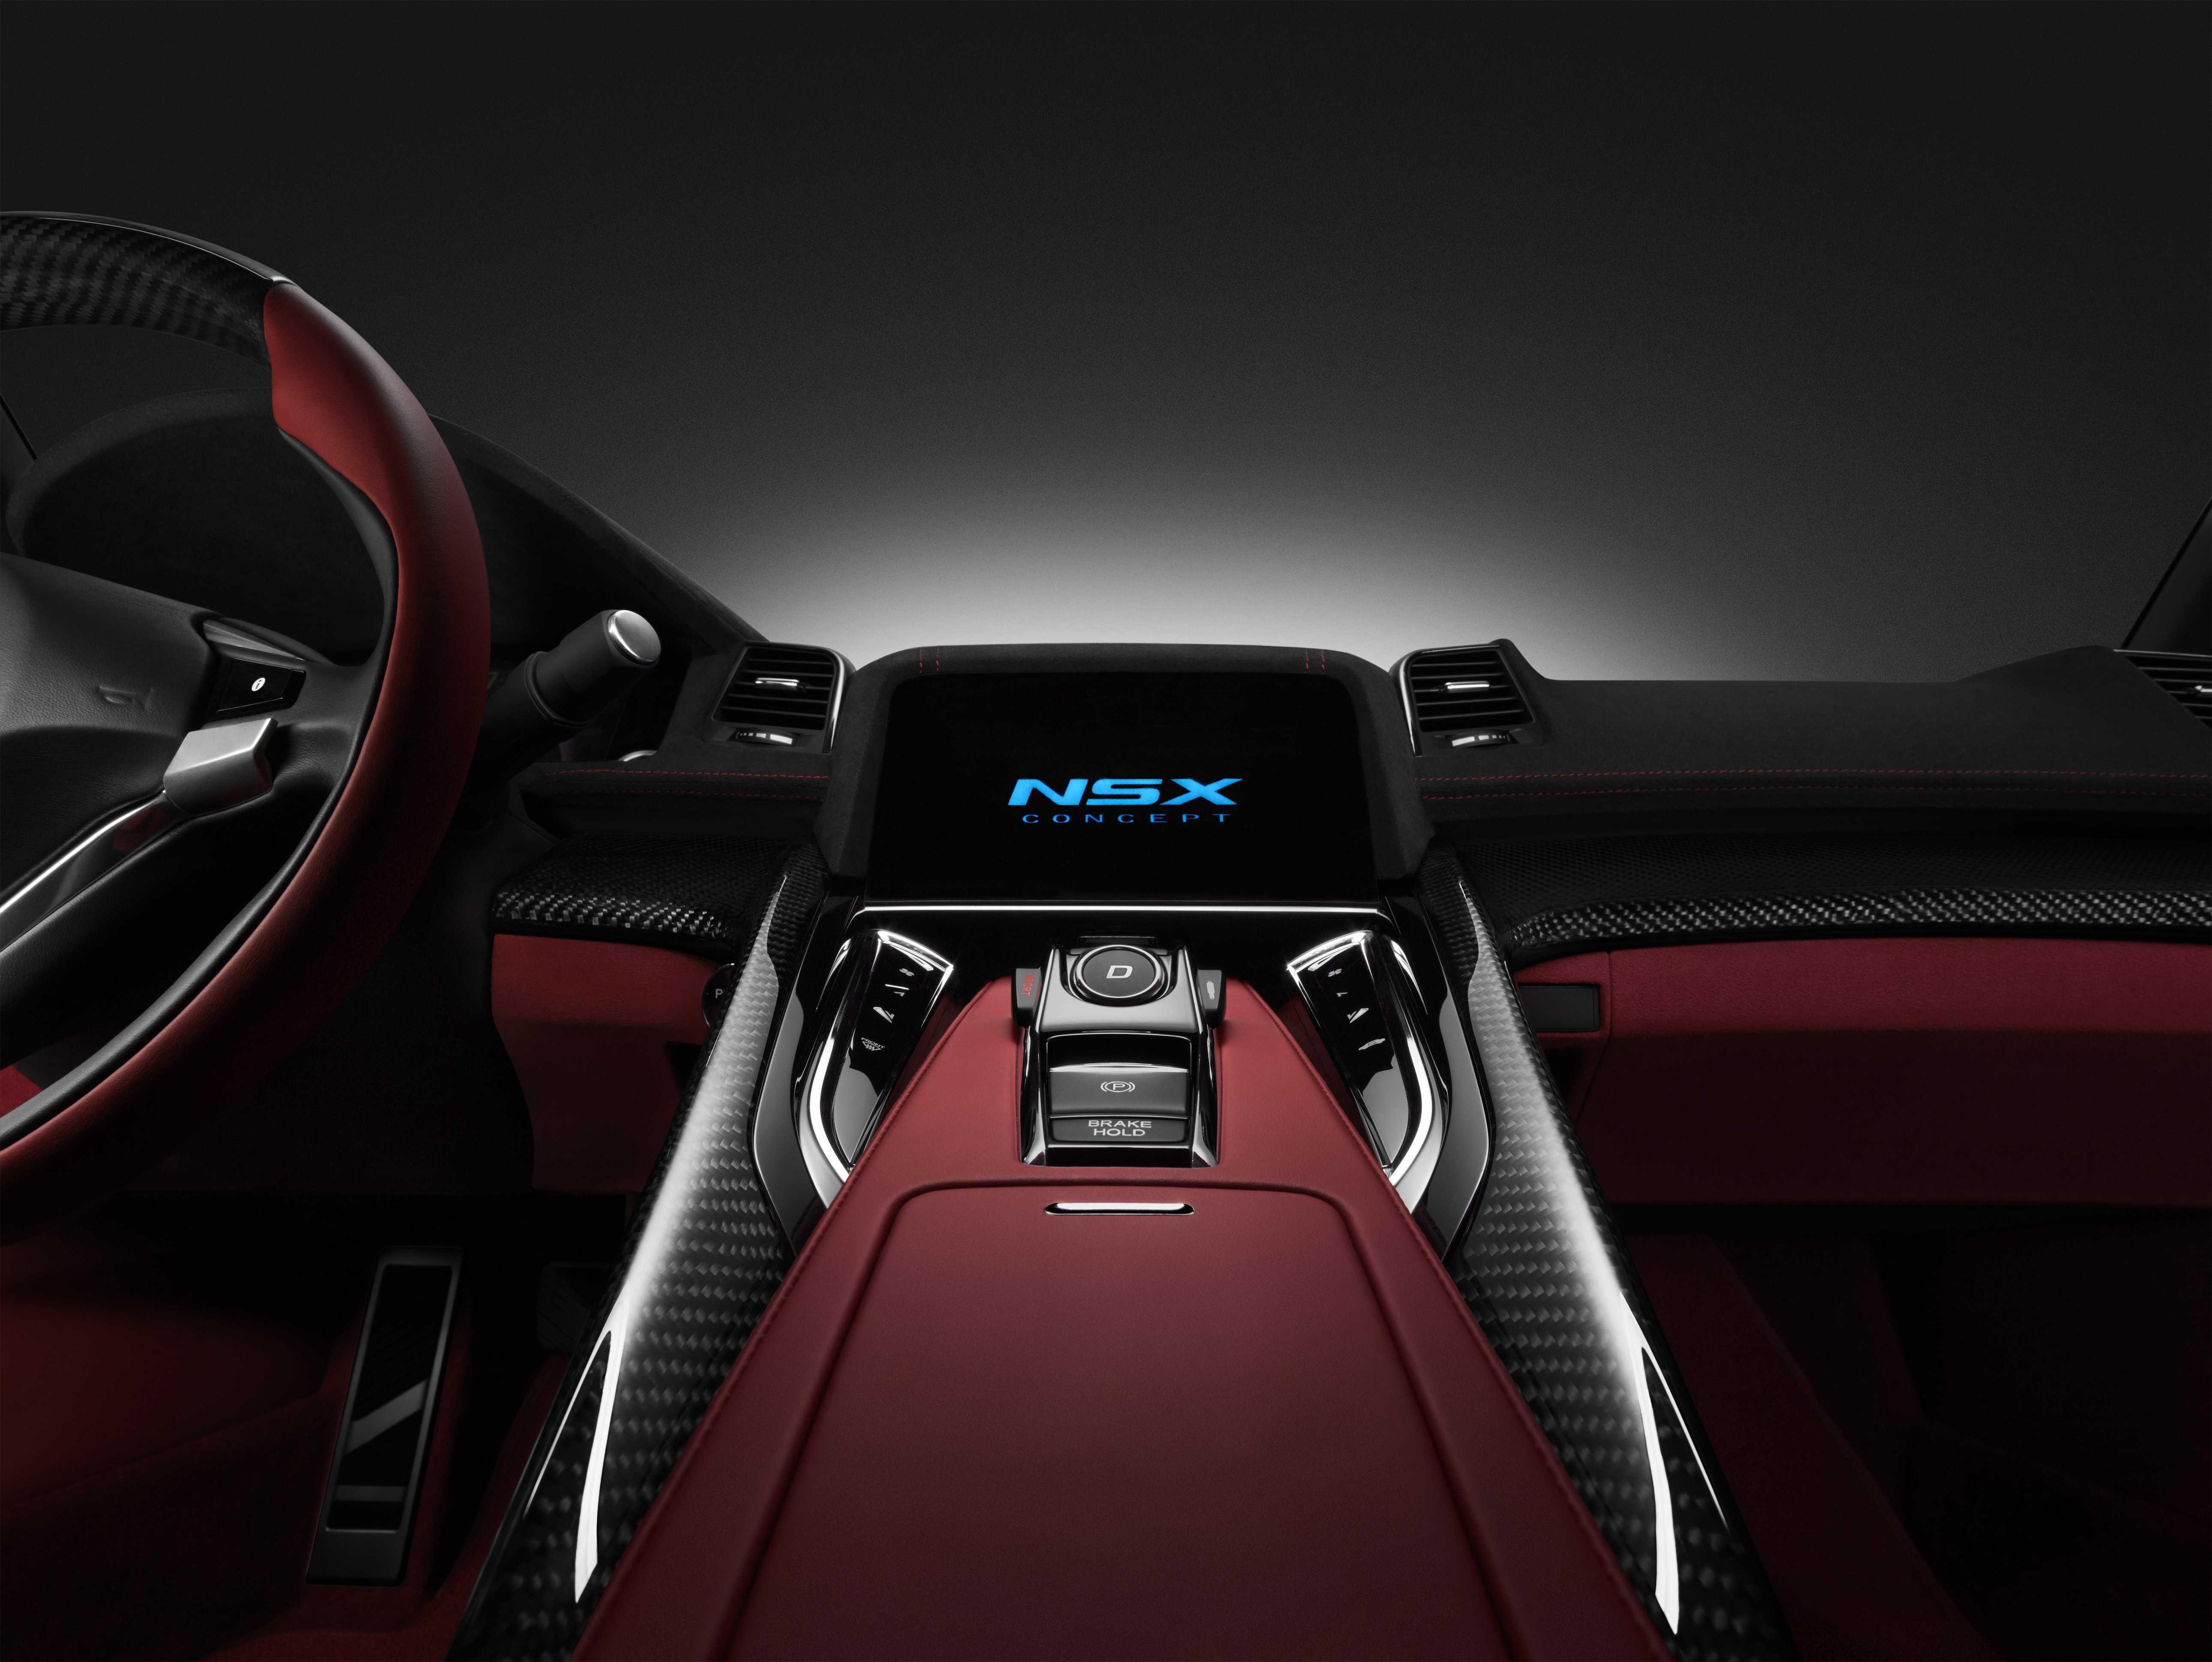 Honda NSX Concept 2013 Centre Console